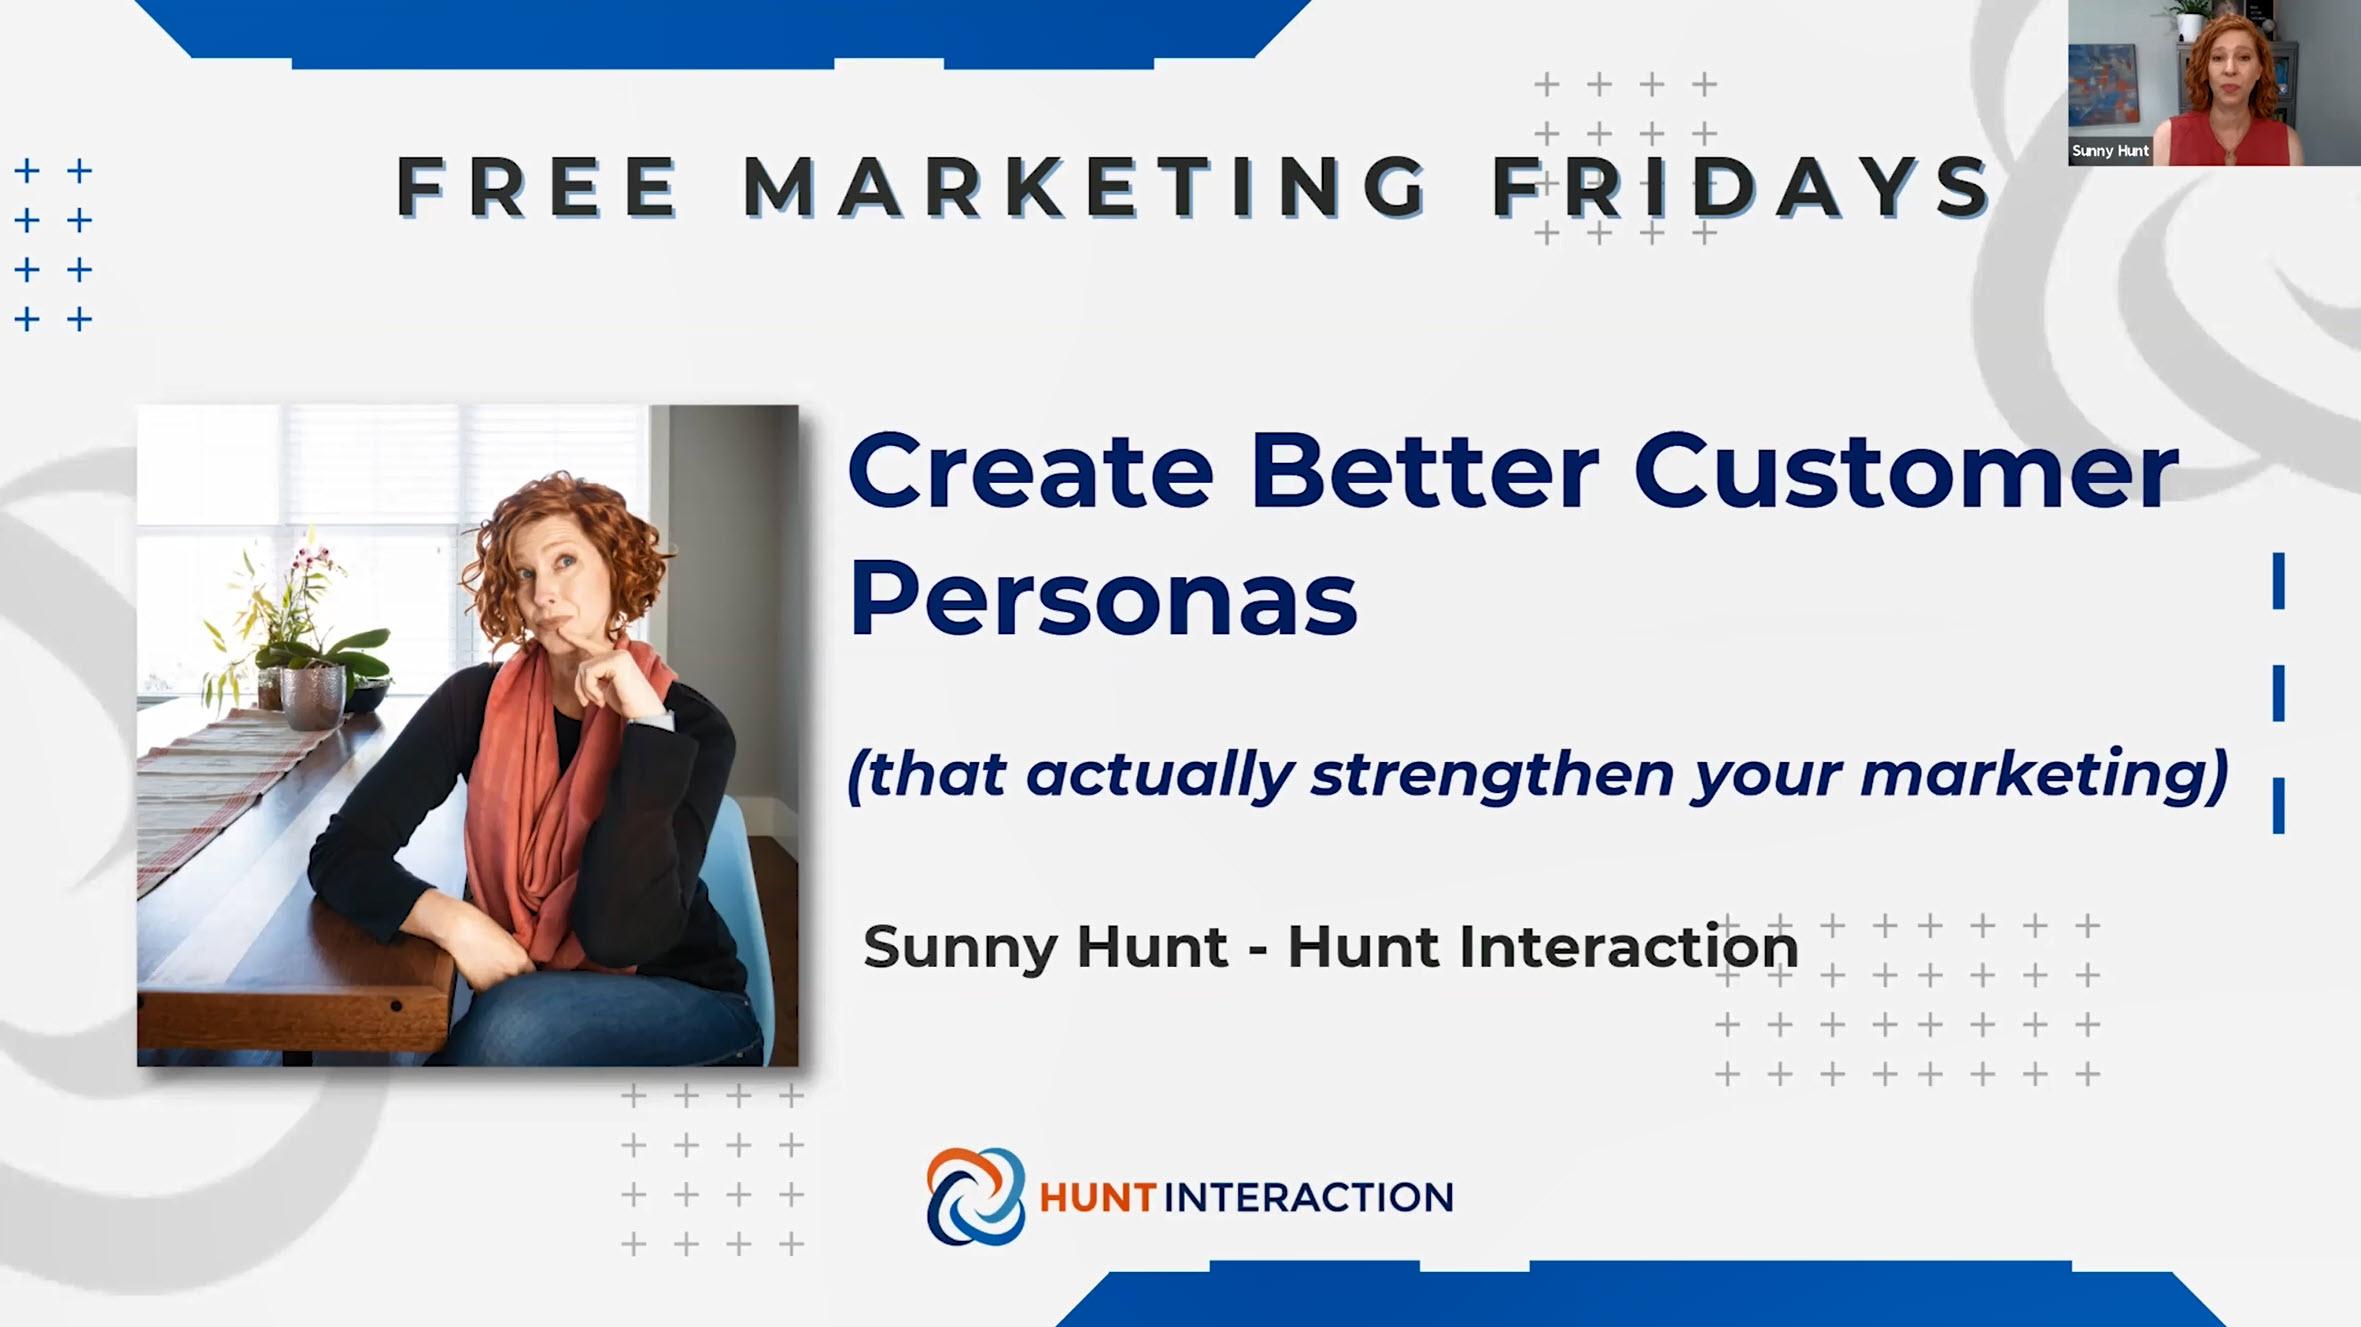 Free Marketing Fridays - Create Better Customer Personas